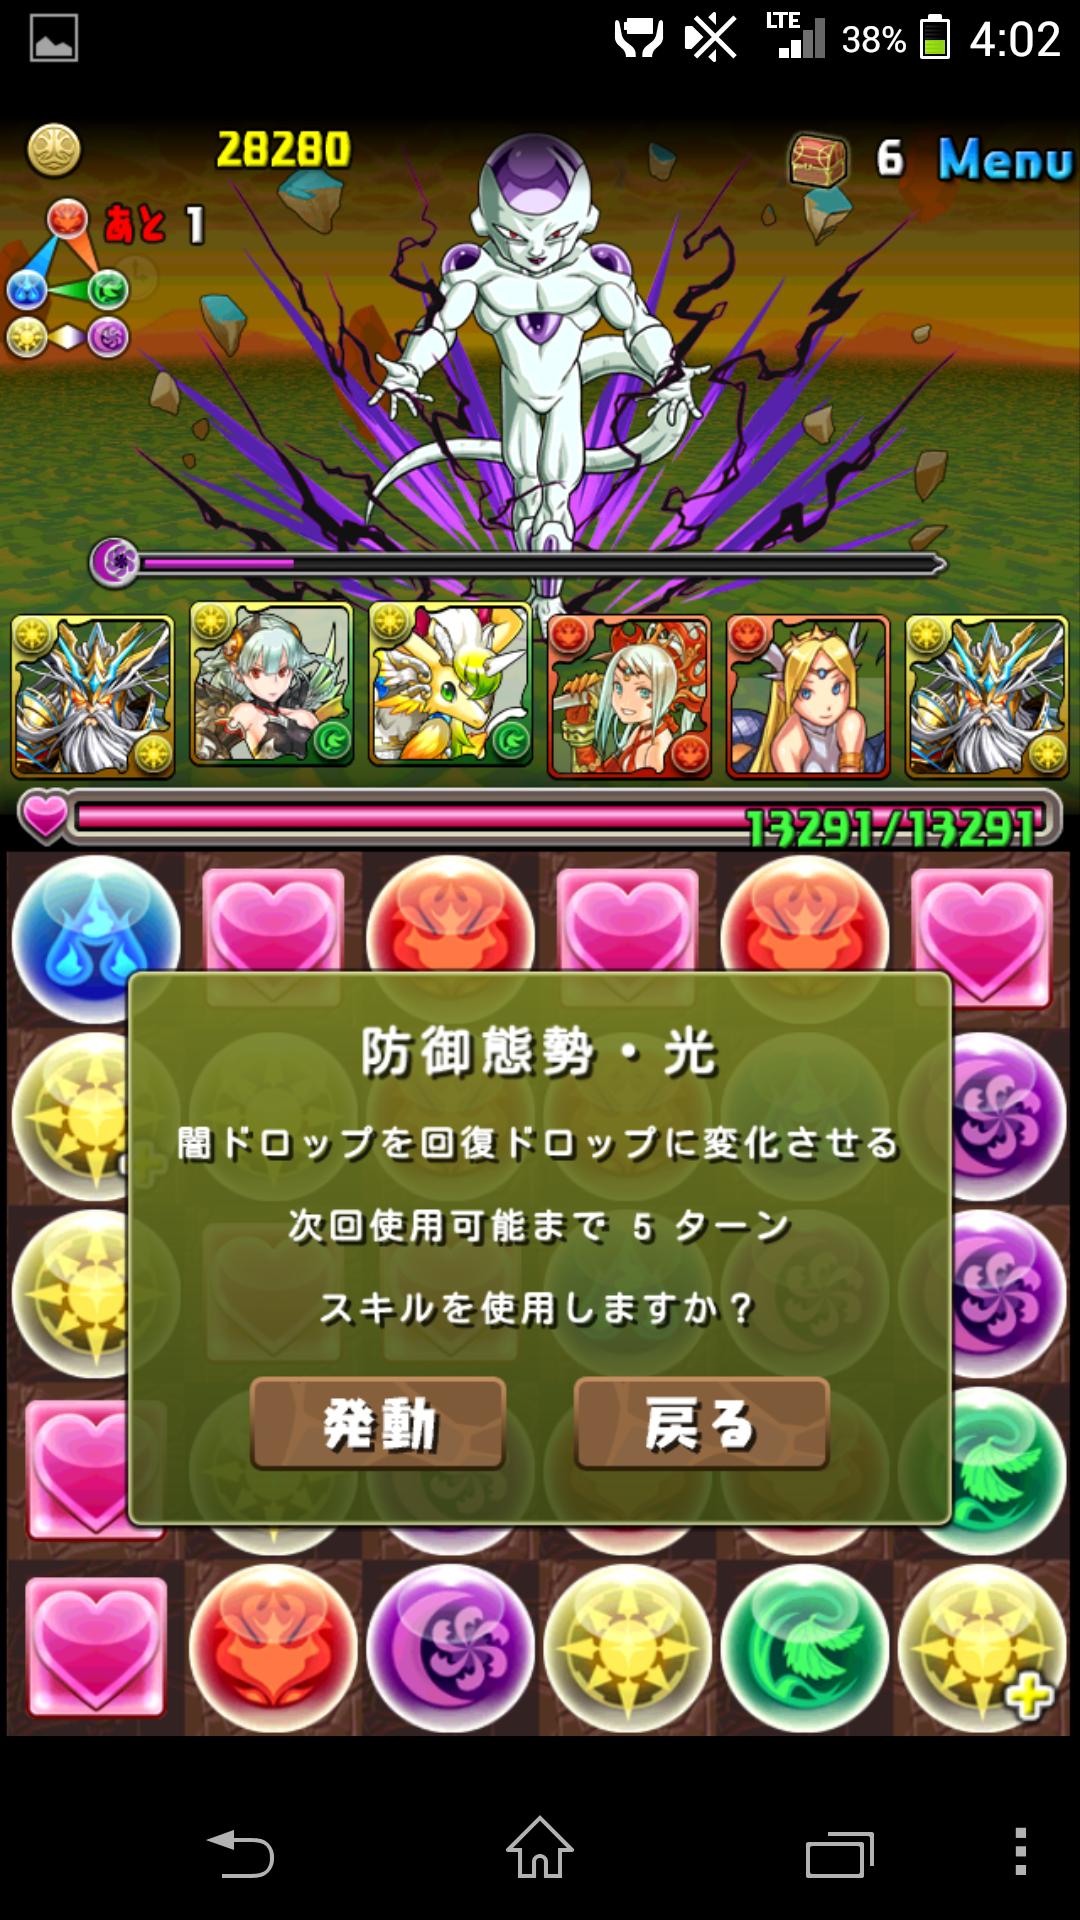 Screenshot_2014-06-06-04-02-47.png